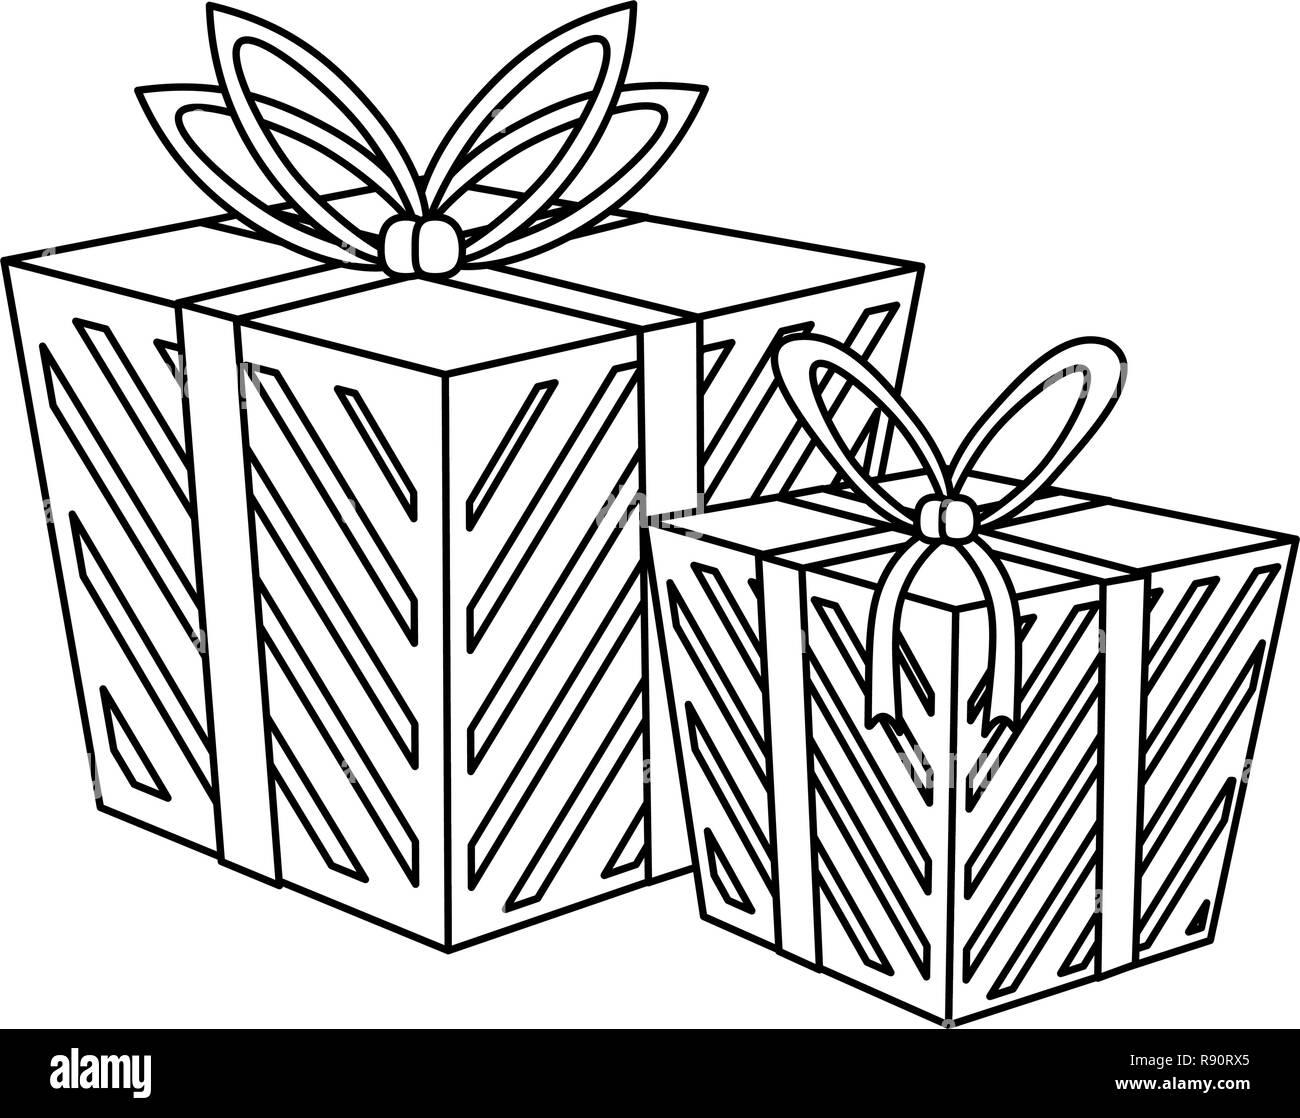 Christmas Gift Boxes Black And White Stock Vector Image Art Alamy